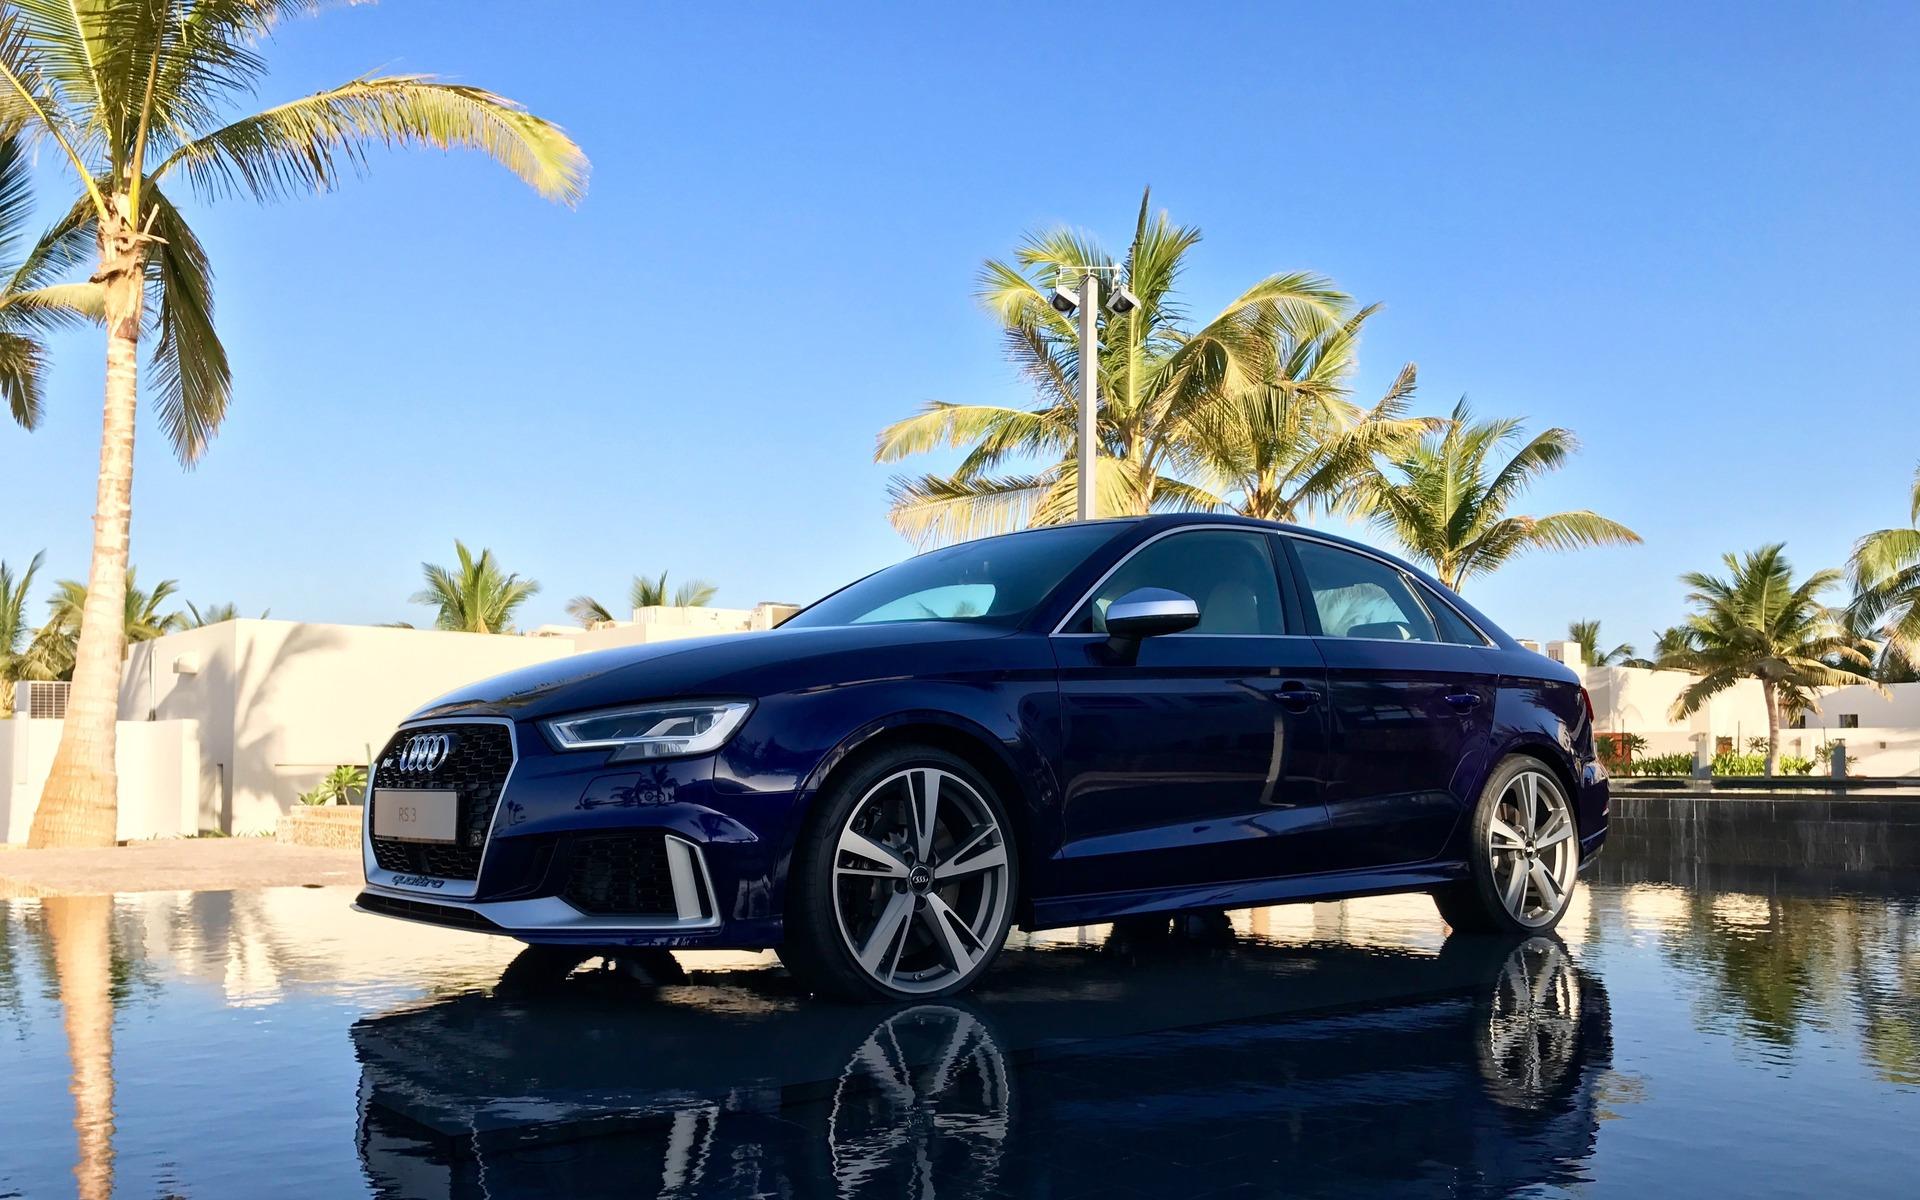 2018 Audi Rs 3 The Ultimate Sleeper 21 23